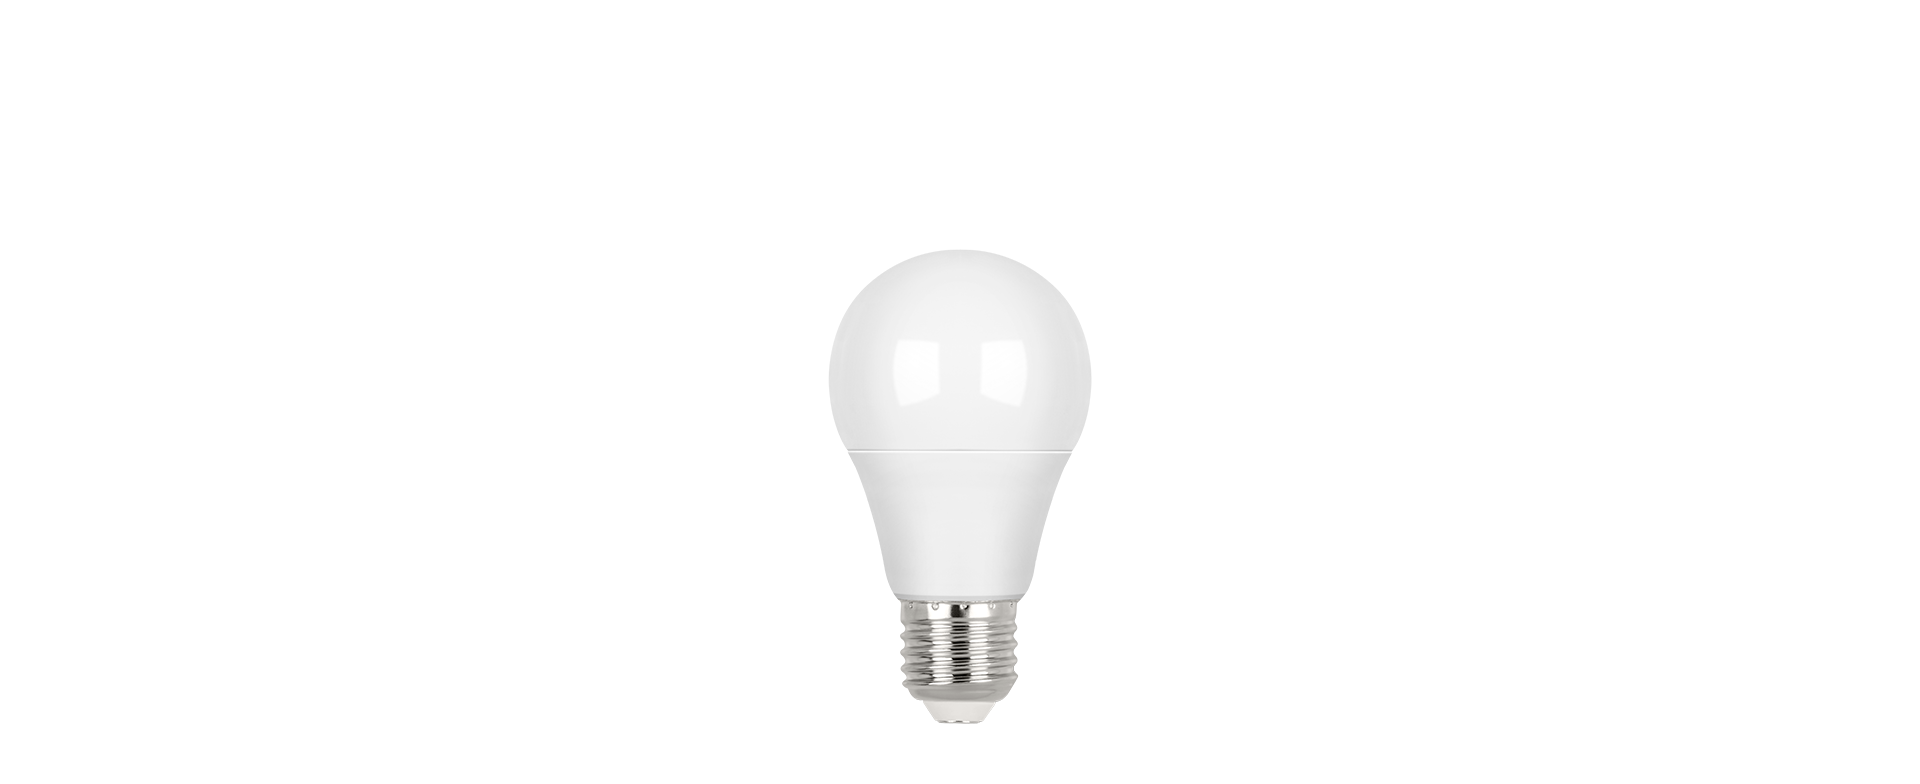 LÂMPADA LED BULBO 9W 2700K BRANCO QUENTE 720lm  STH8265/27- STELLA